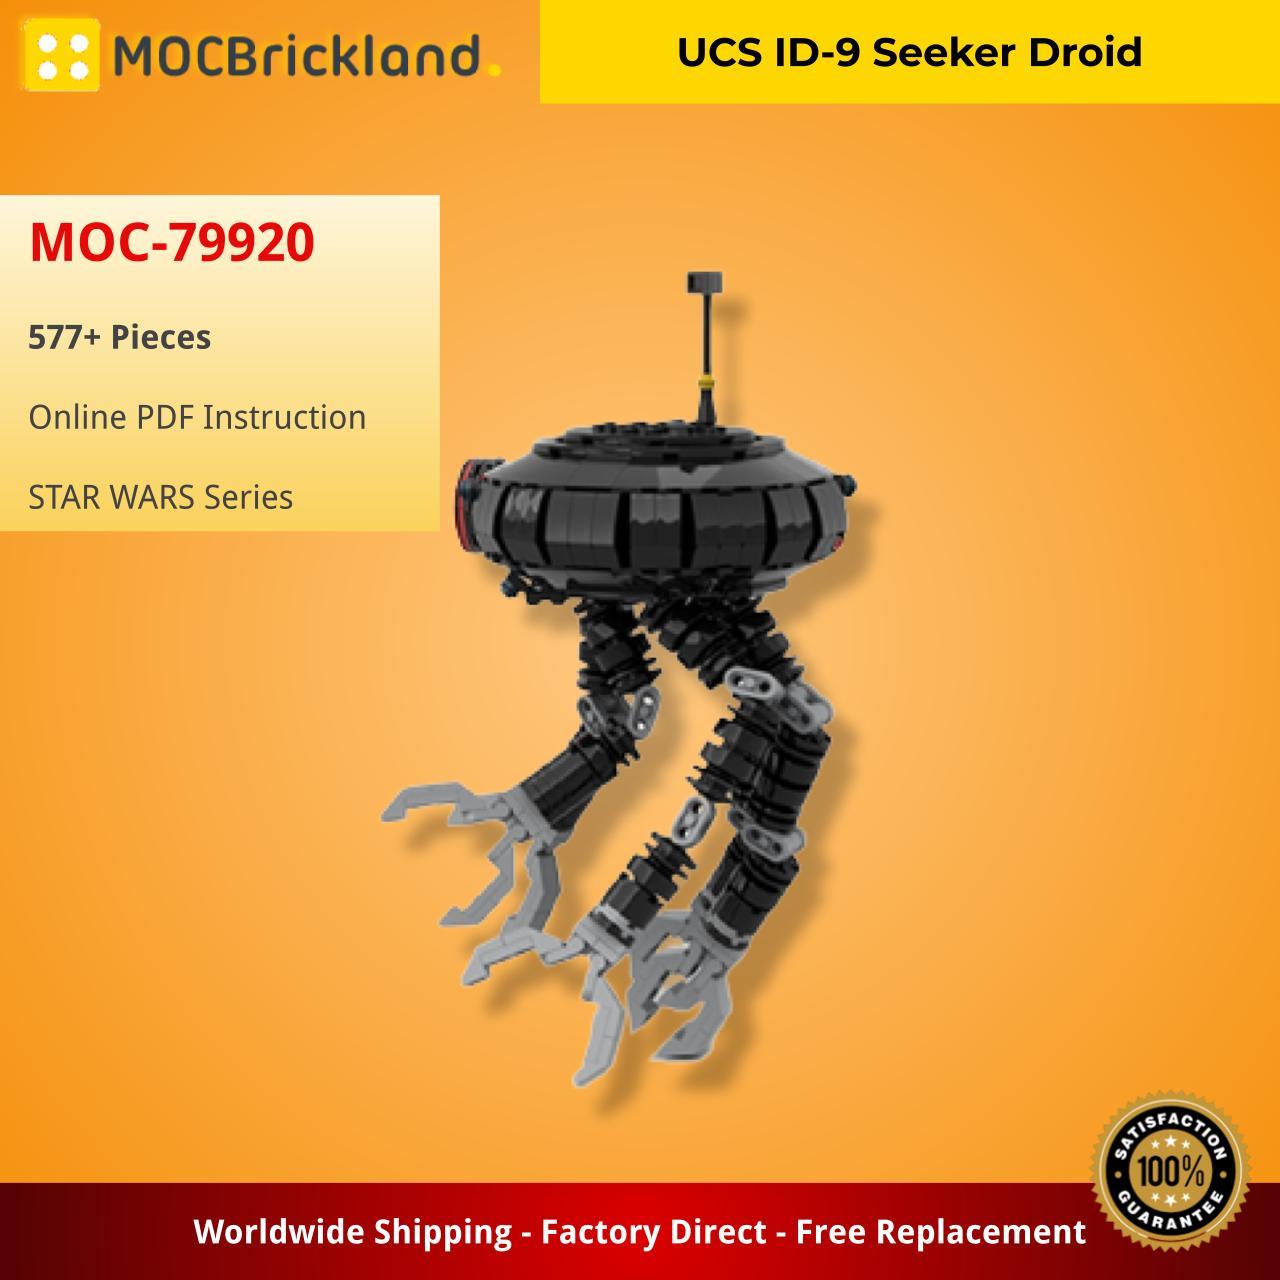 UCS ID-9 Seeker Droid STAR WARS MOC-79920 by Bowdbricks WITH 577 PIECES